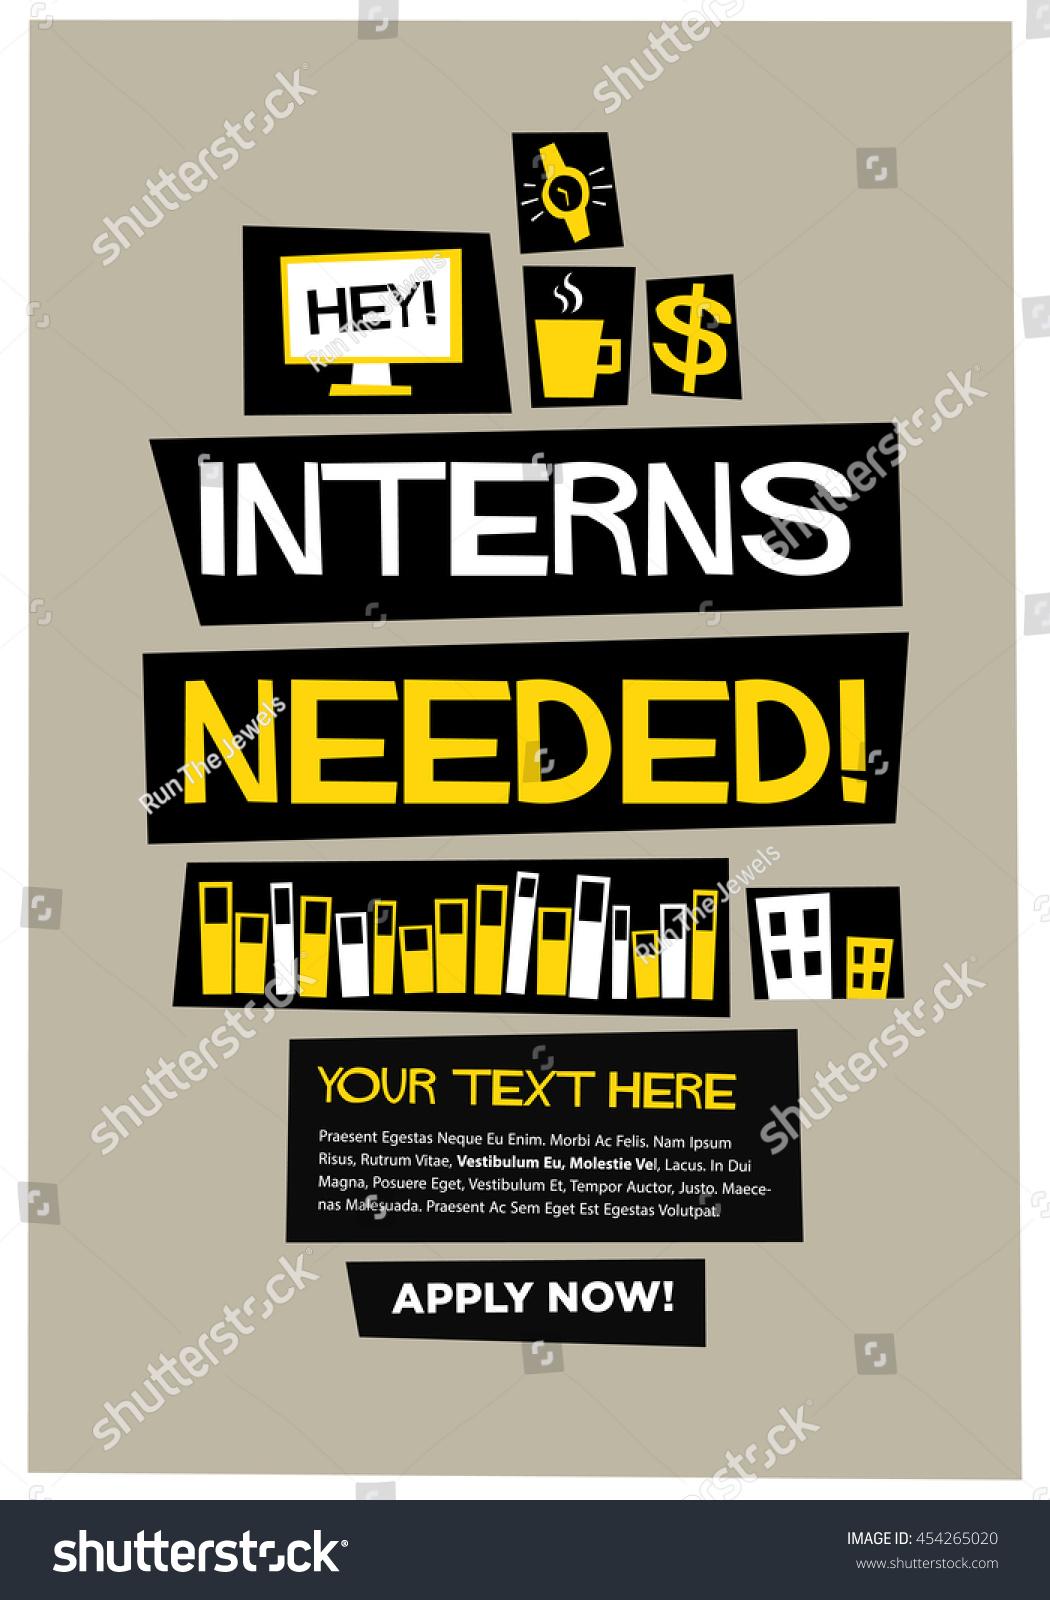 interns needed flat style vector illustration stock vector, Presentation templates